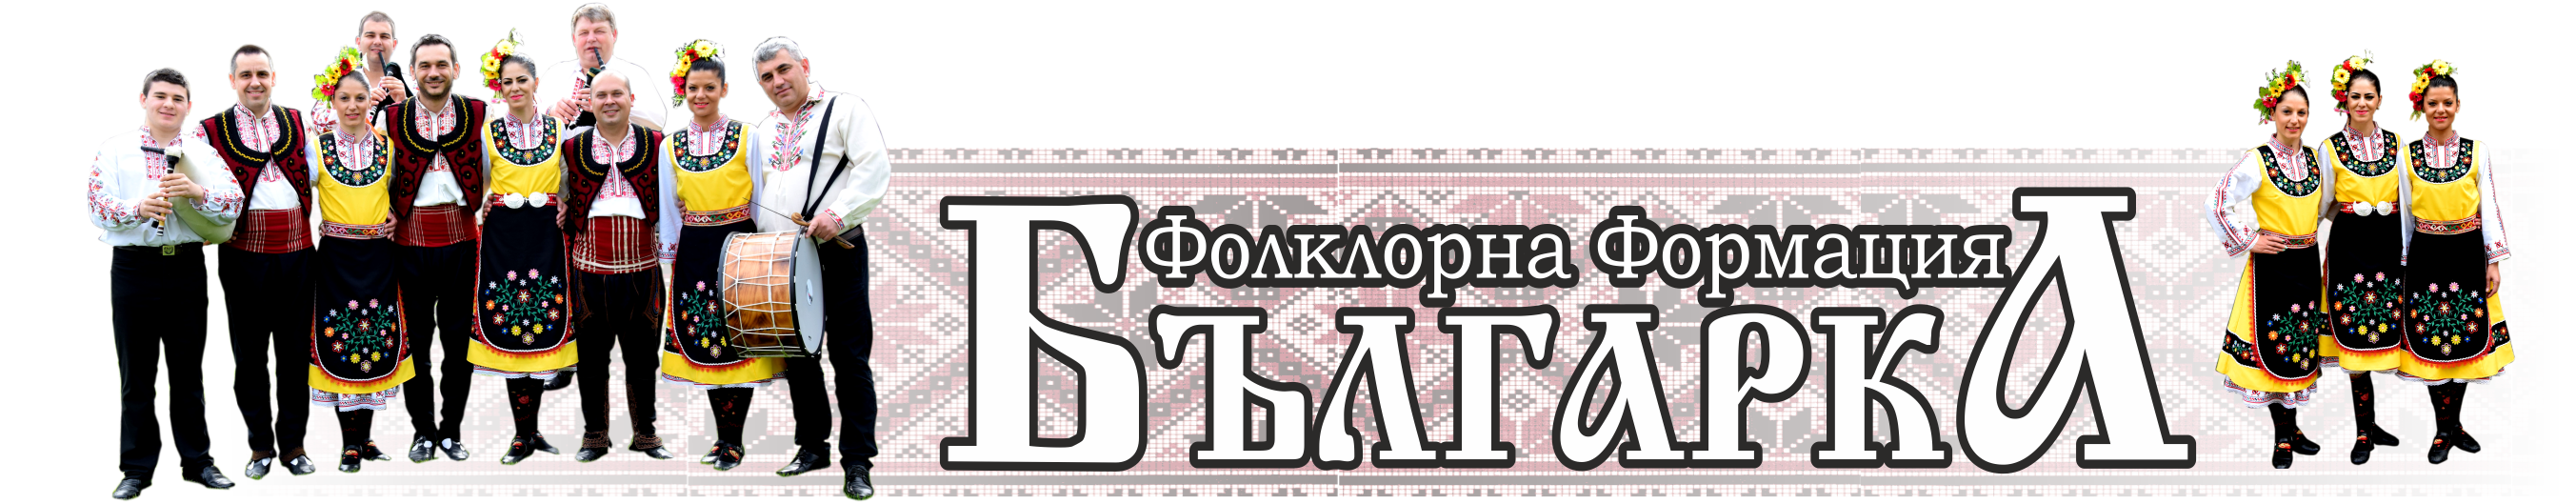 Формация Българка